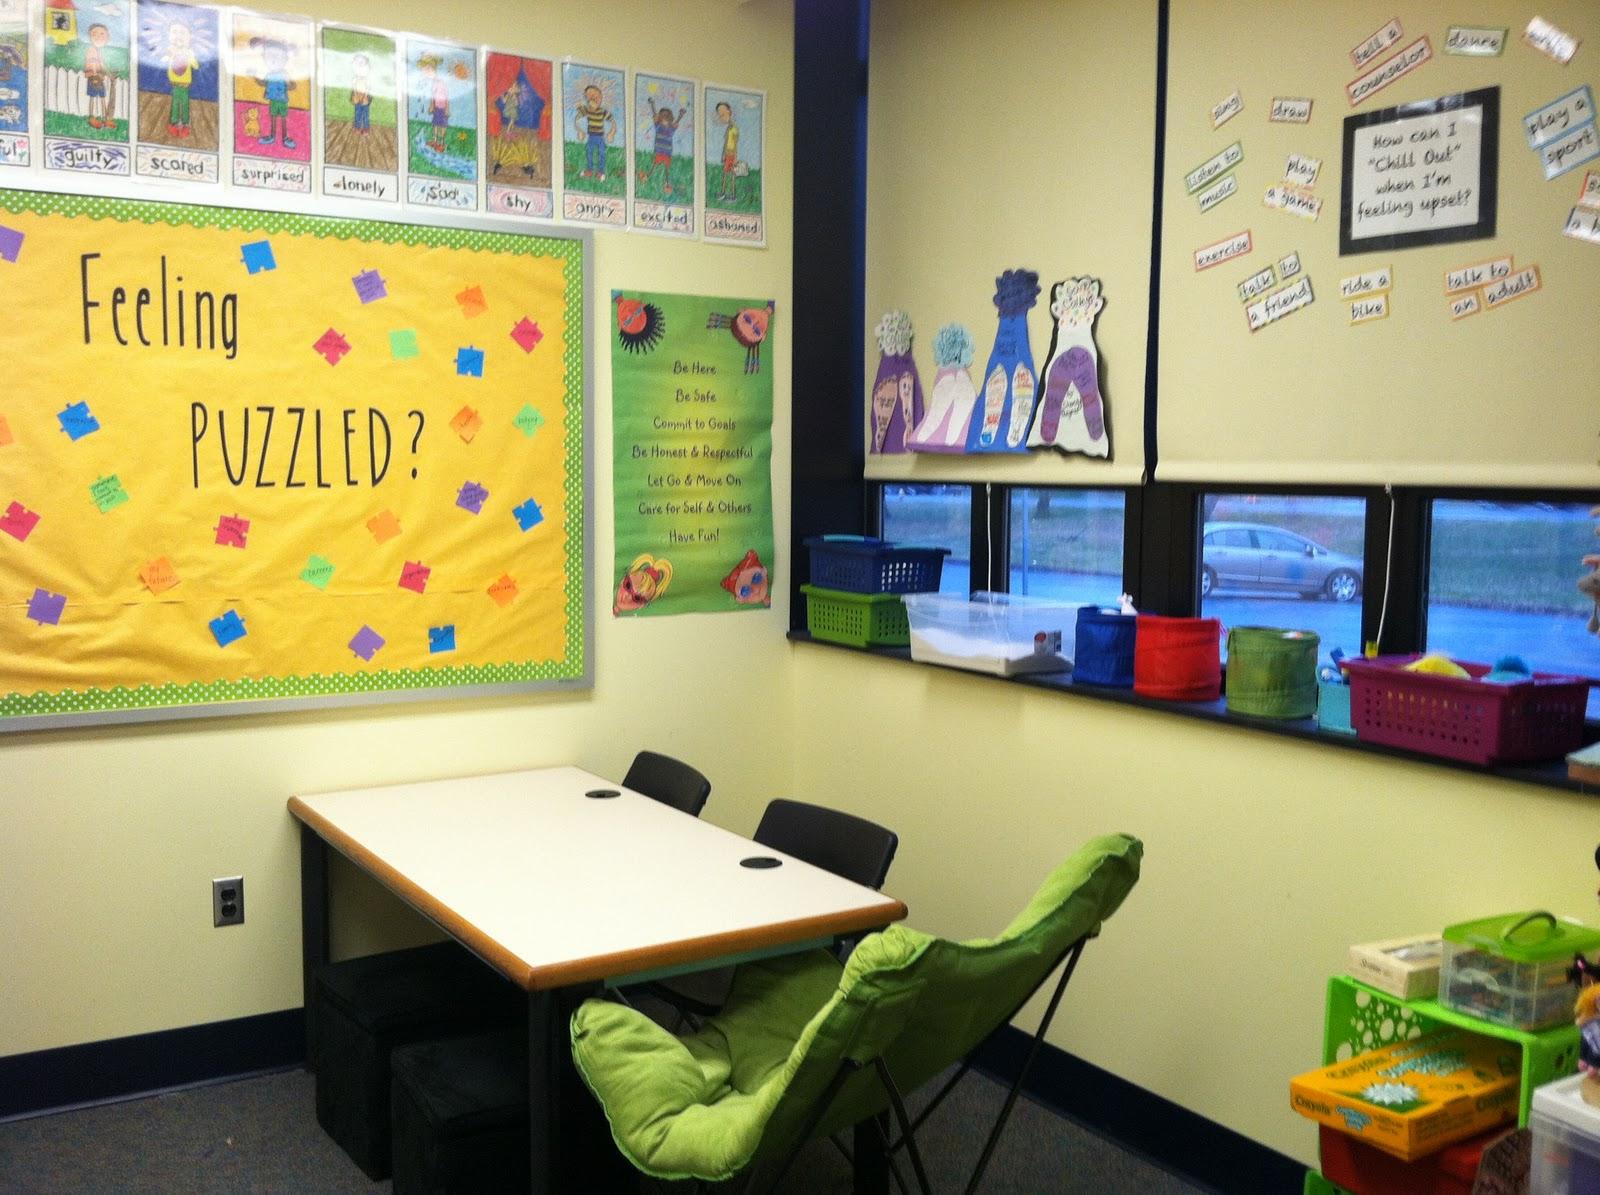 School Counselor Office Wall Decor